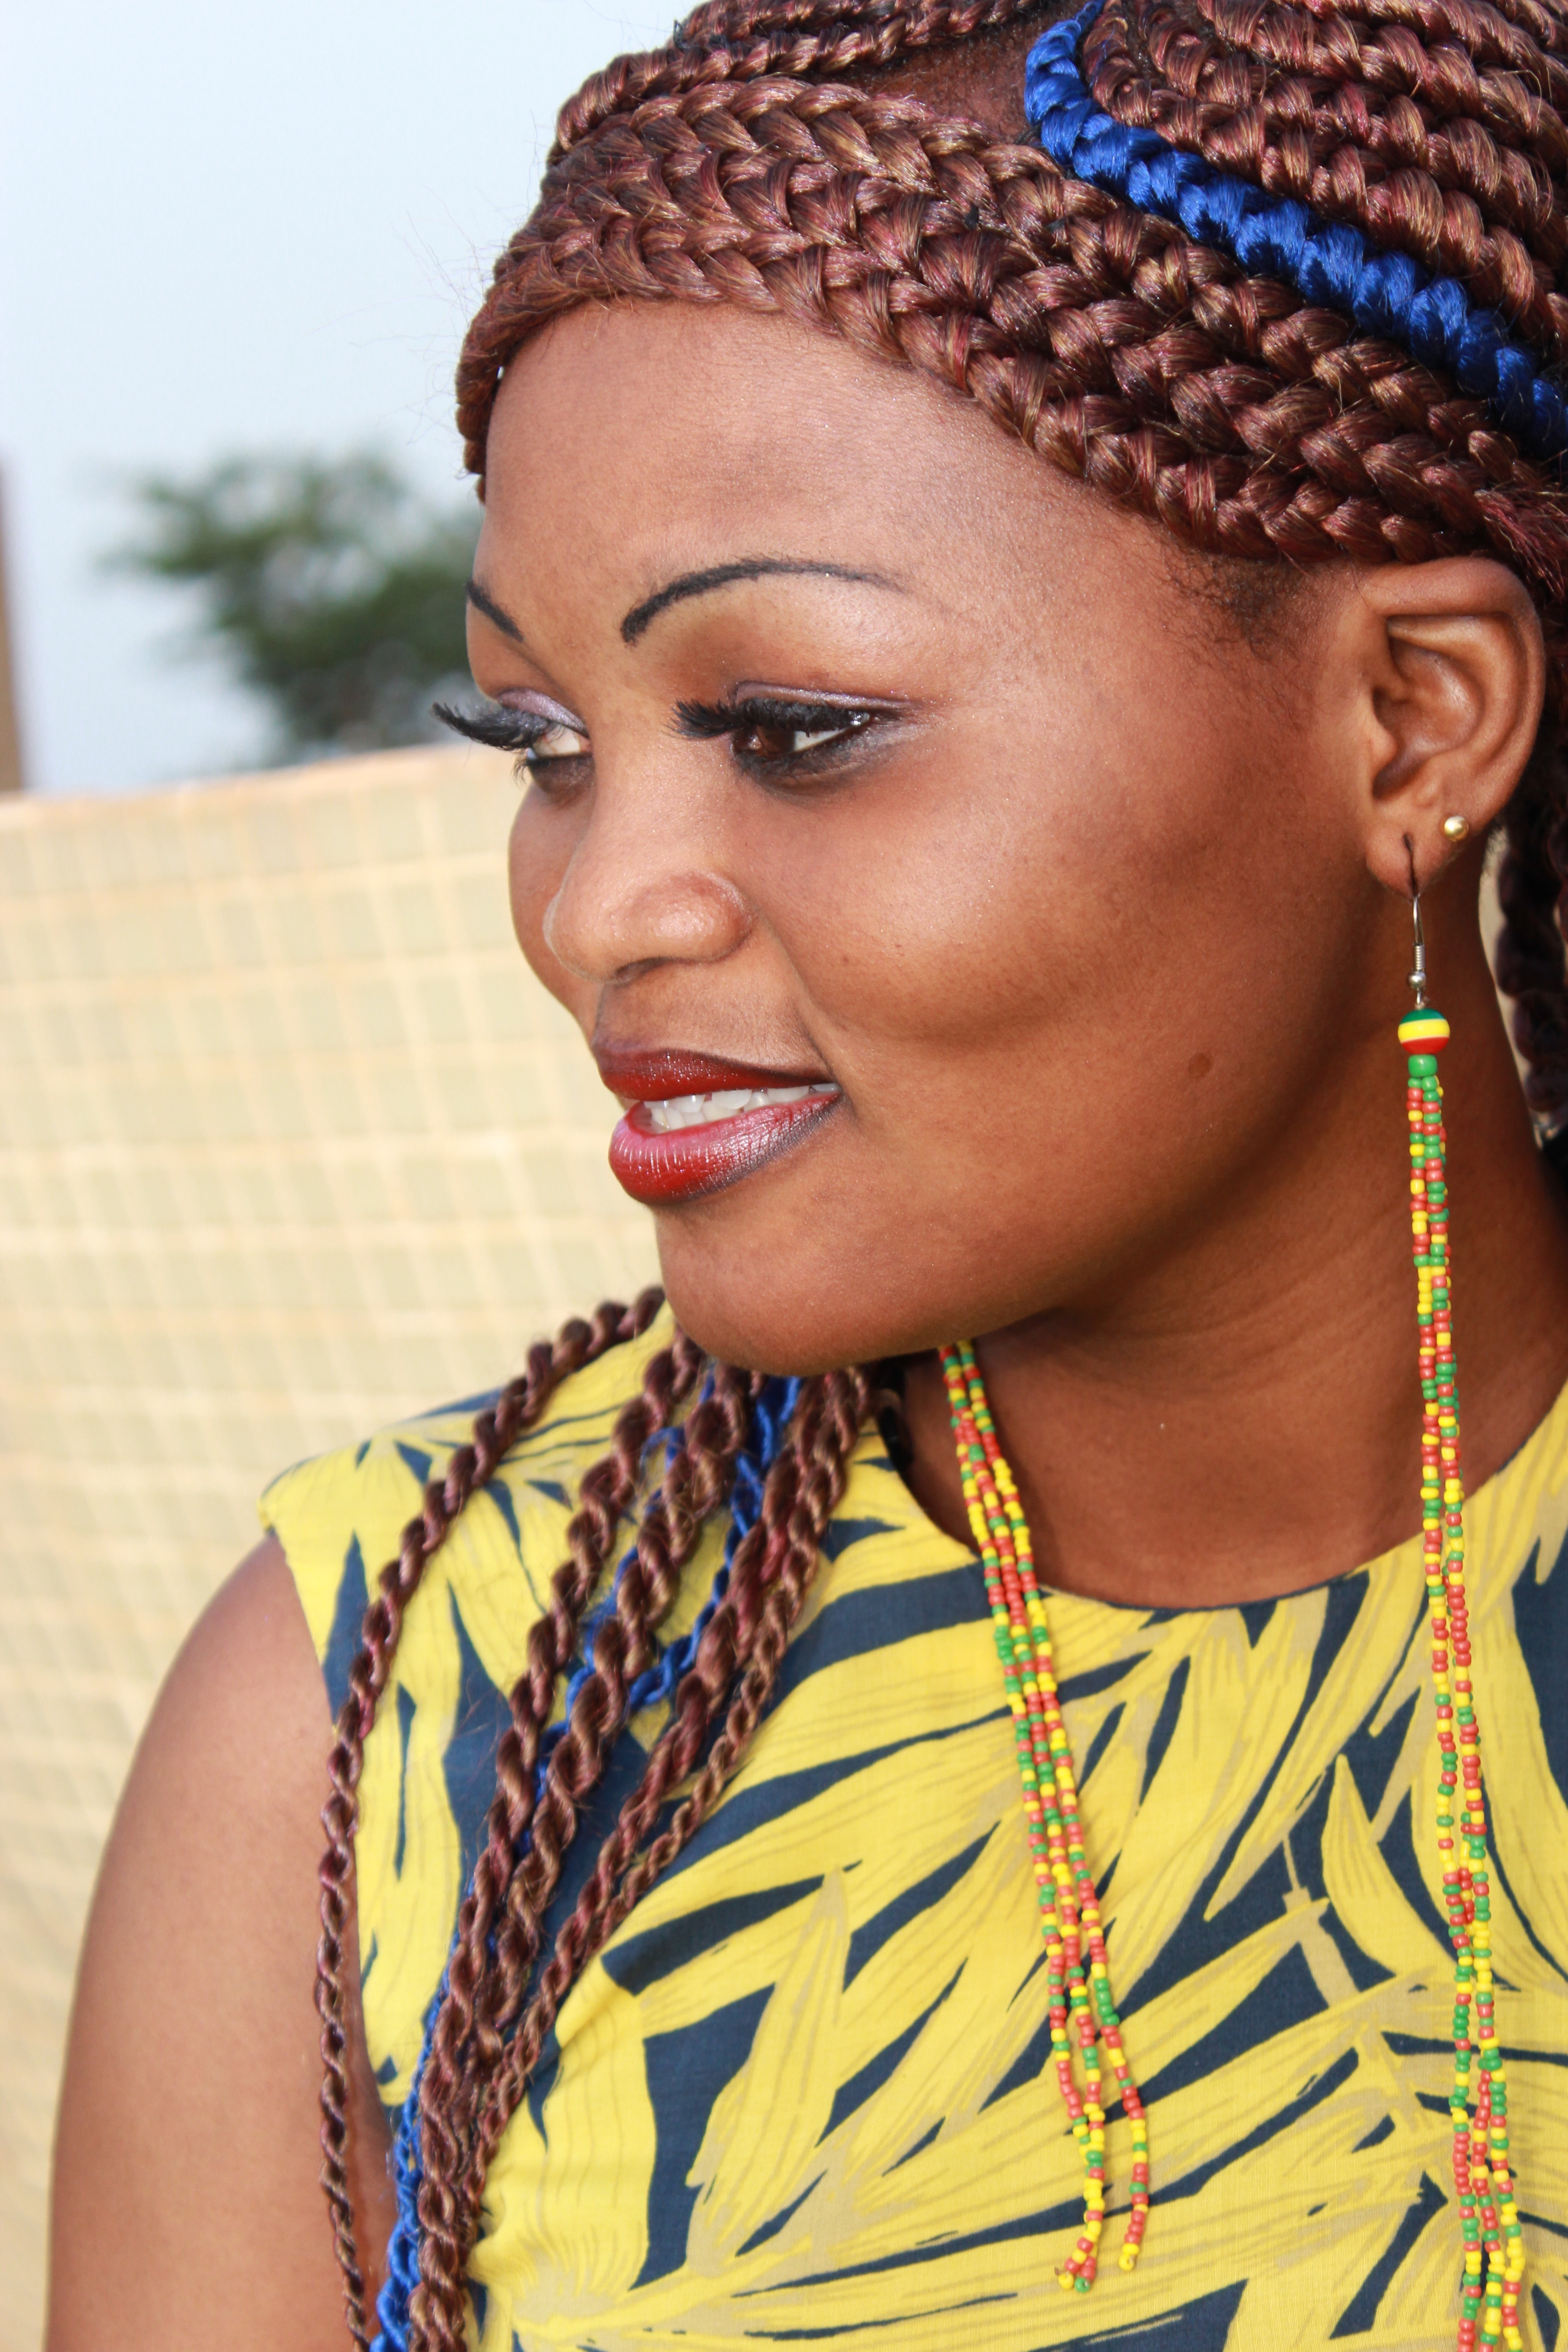 фото имена африканских певиц